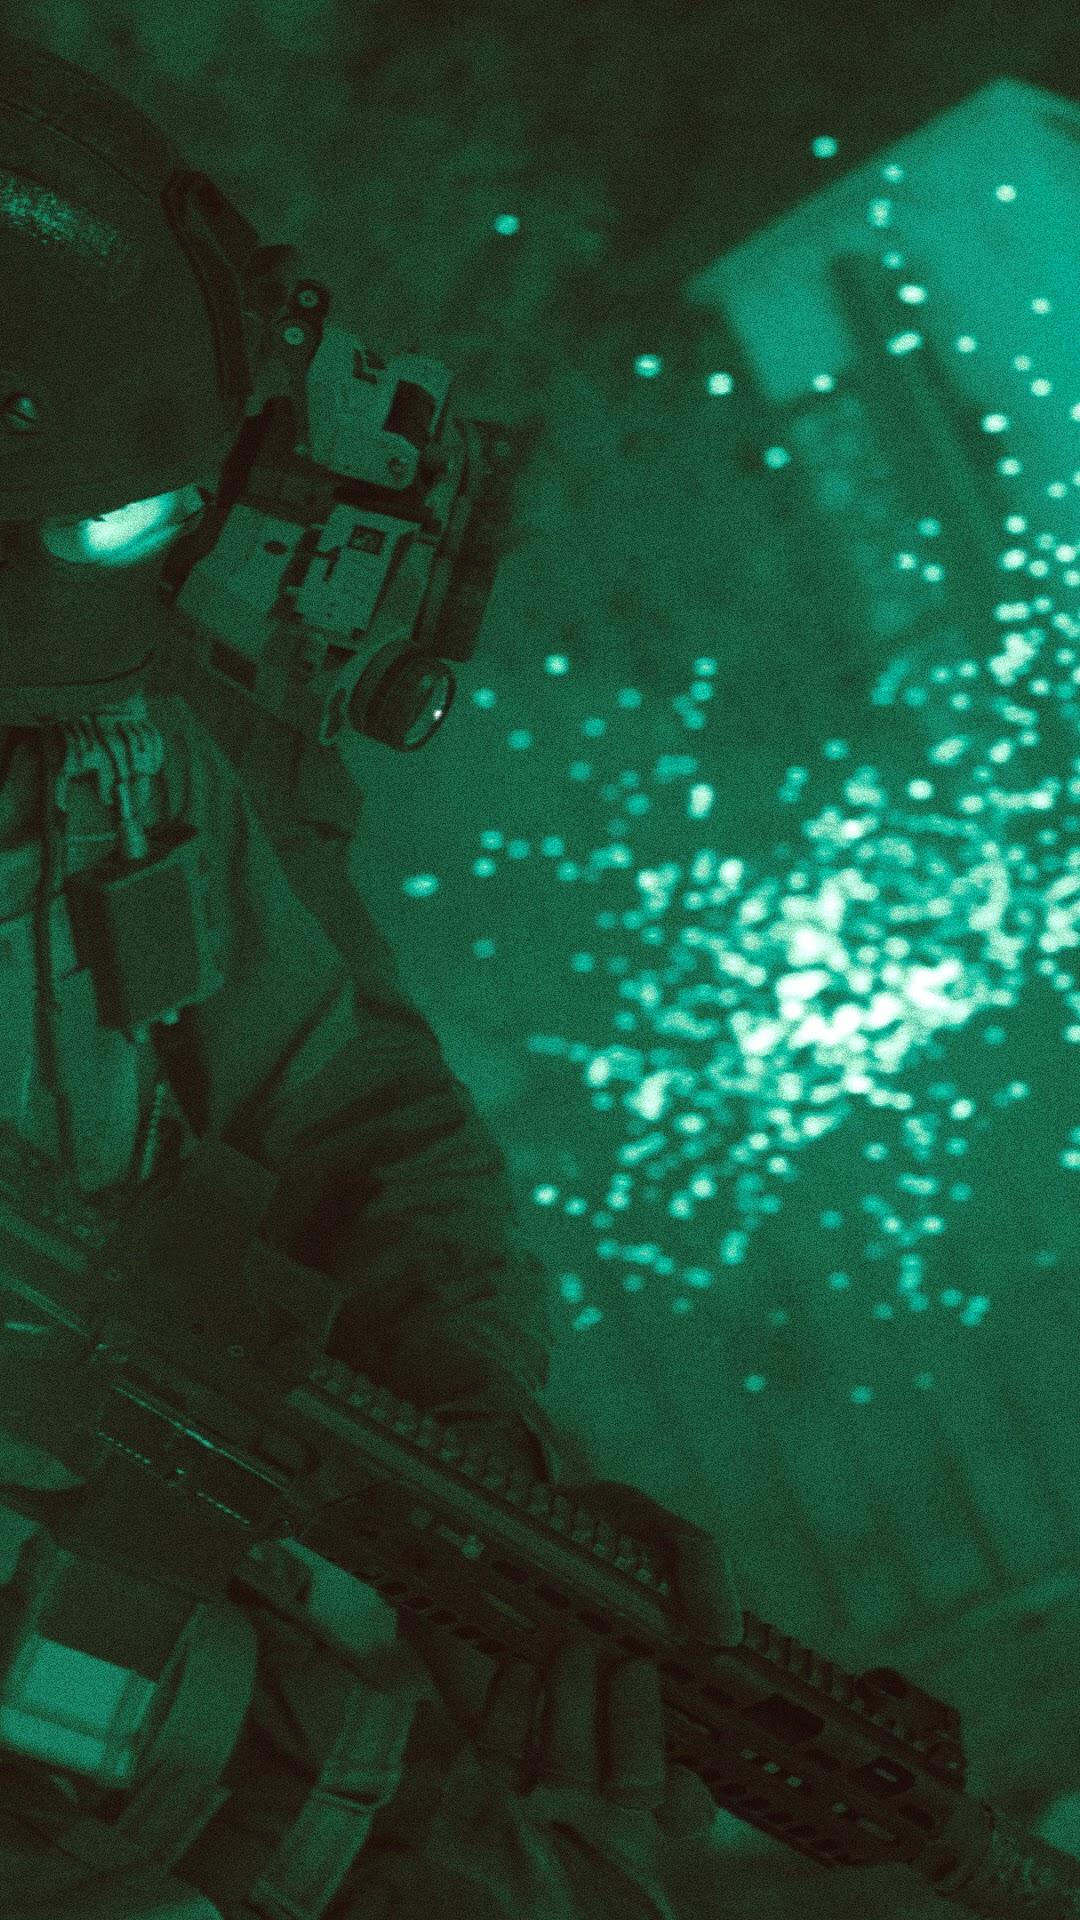 Call Of Duty Modern Warfare Soldiers Night Vision 4k Wallpaper 6